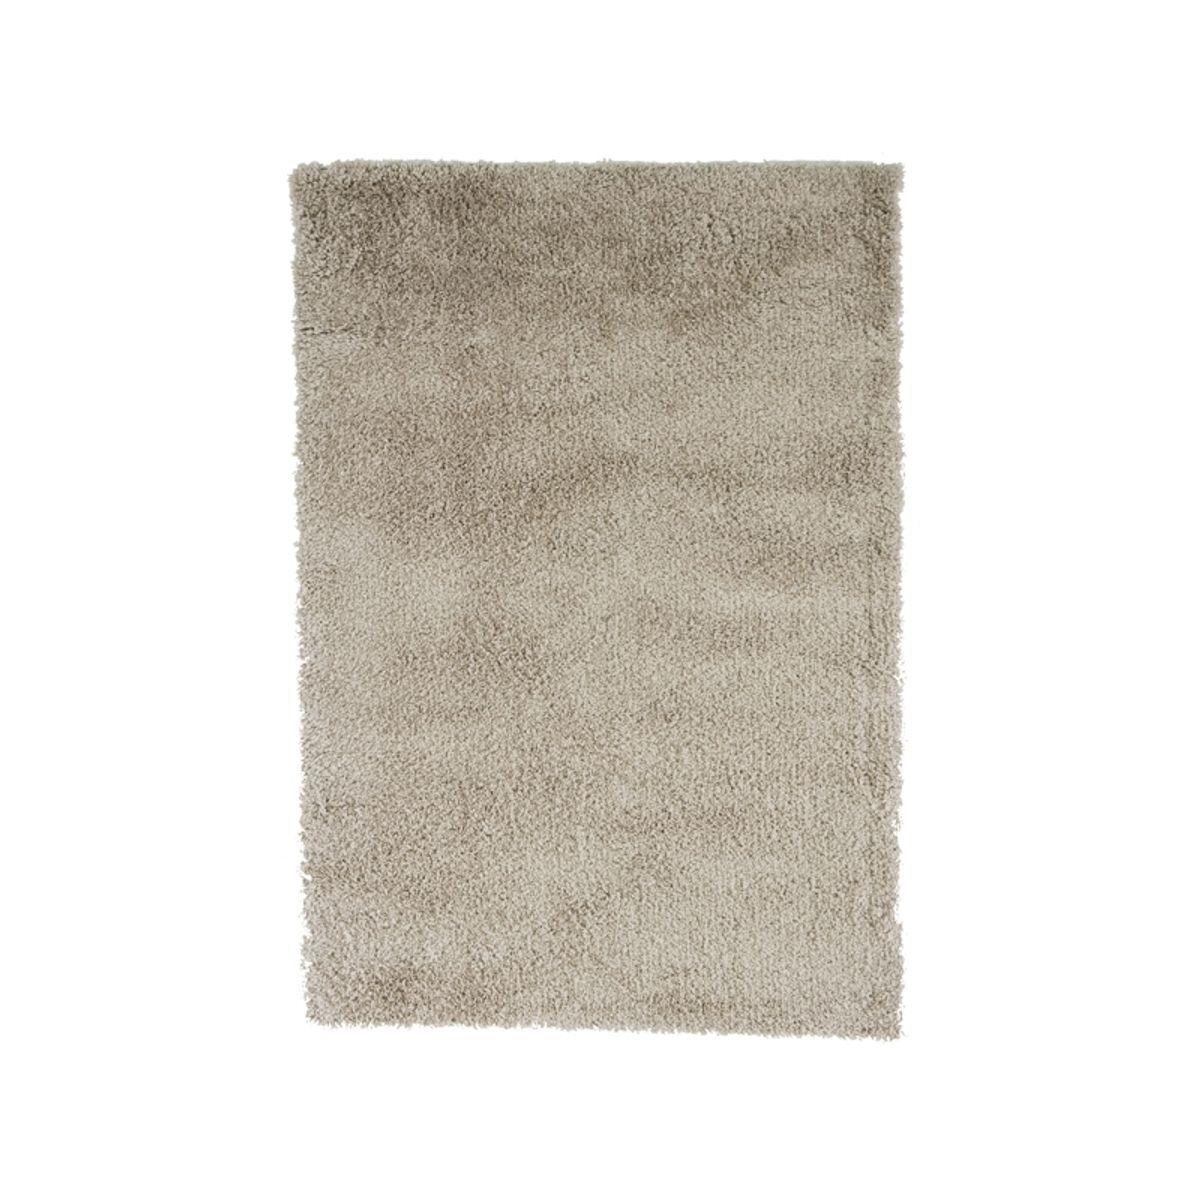 Tapis shaggy blanc nuage Softy 50x80 cm